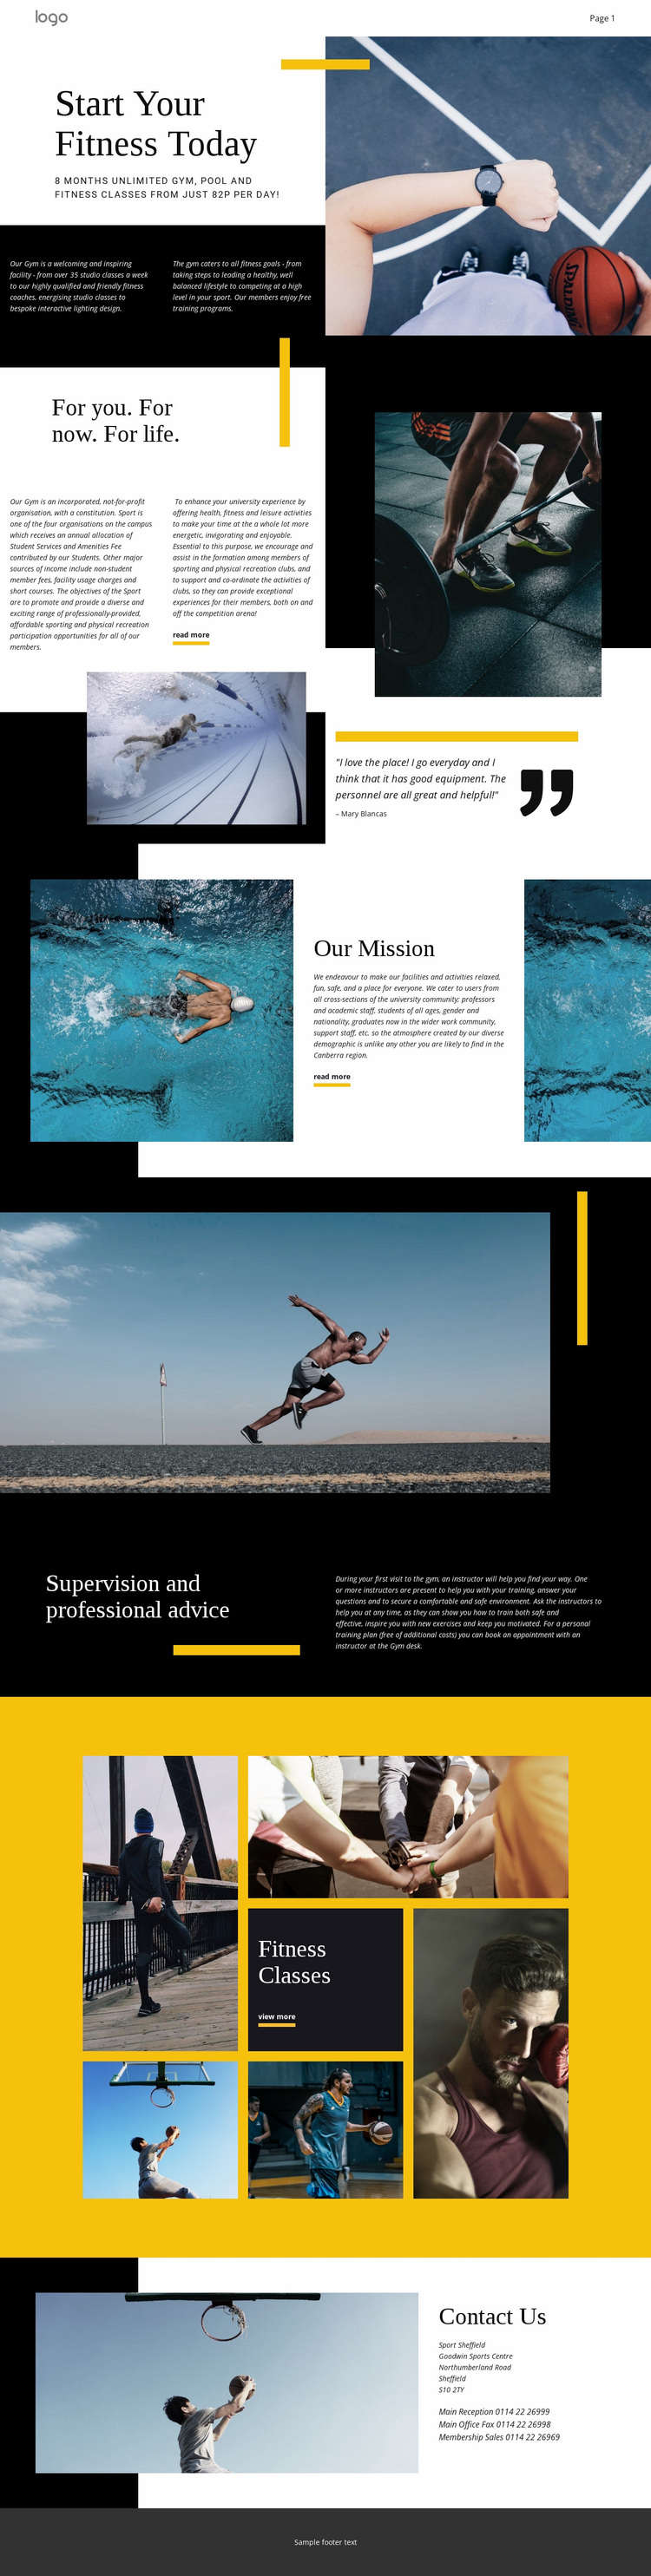 Professional fitness Website Design